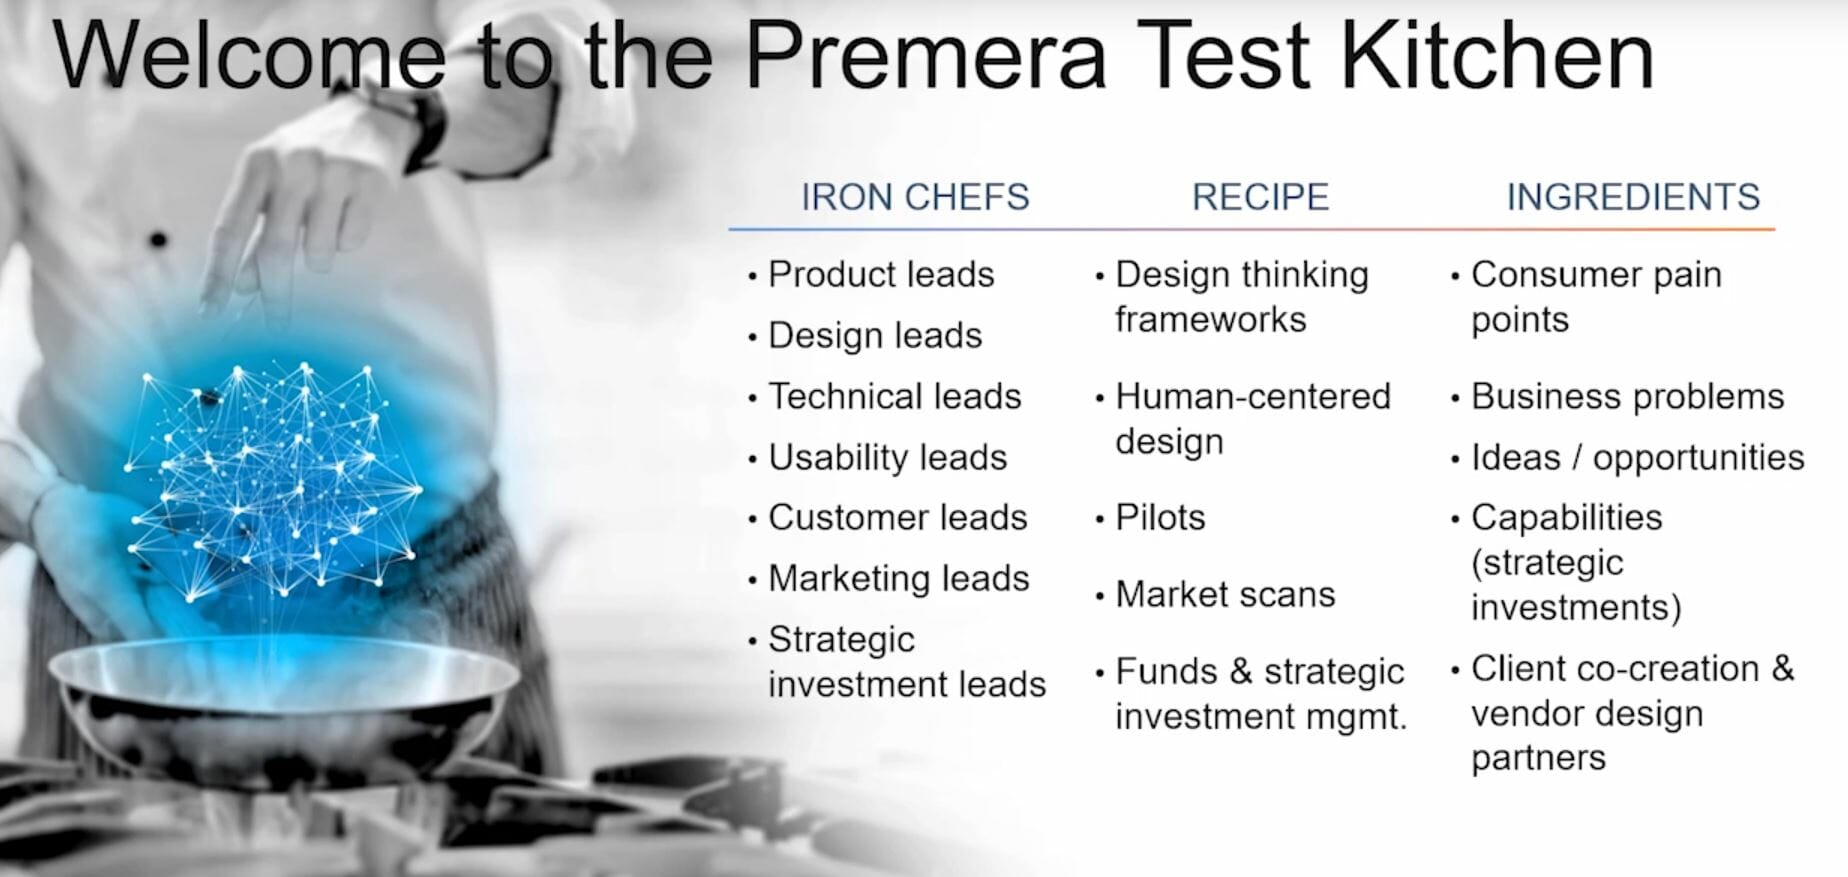 Premera Test Kitchen